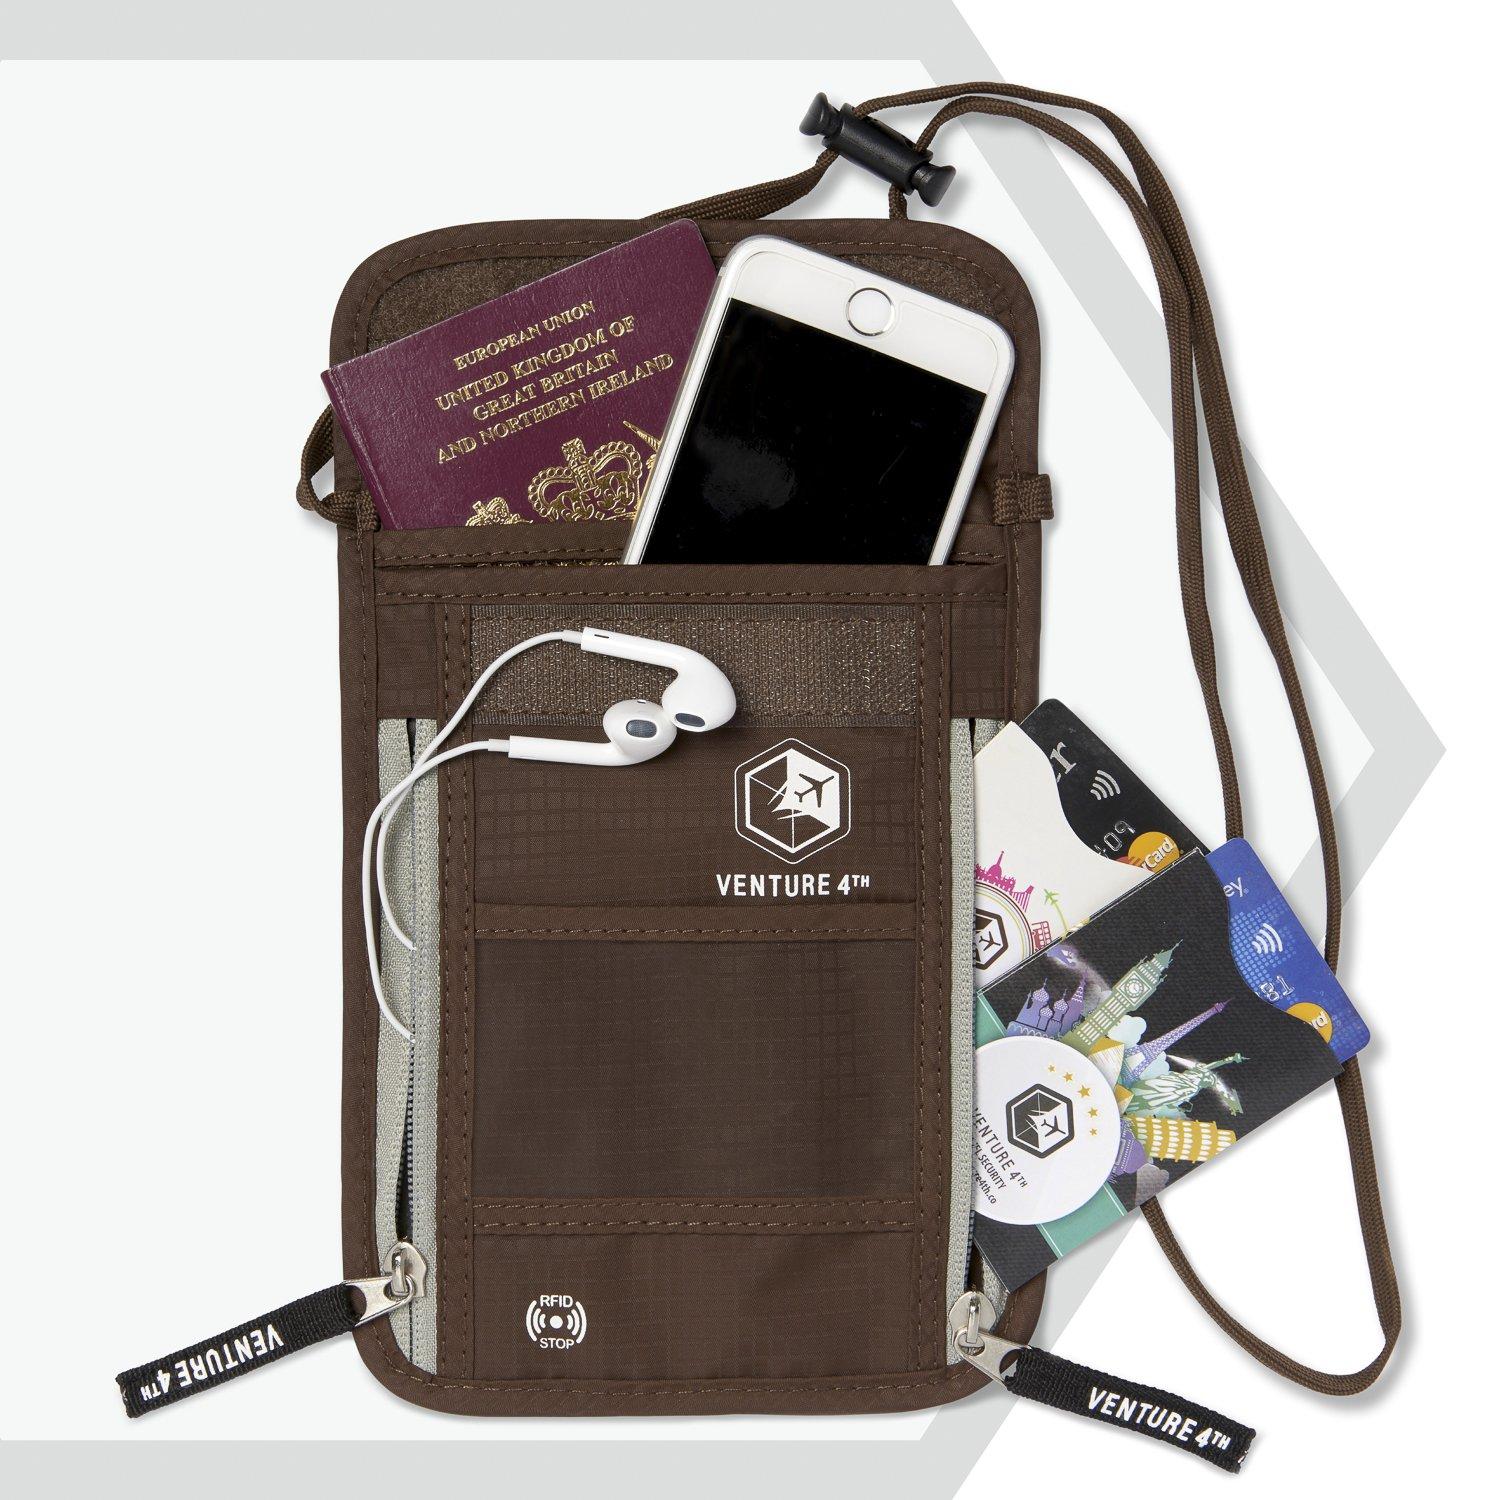 Venture 4th Passport Holder Neck Pouch With RFID – Safety Passport Pouch (Brown) by VENTURE 4TH (Image #2)